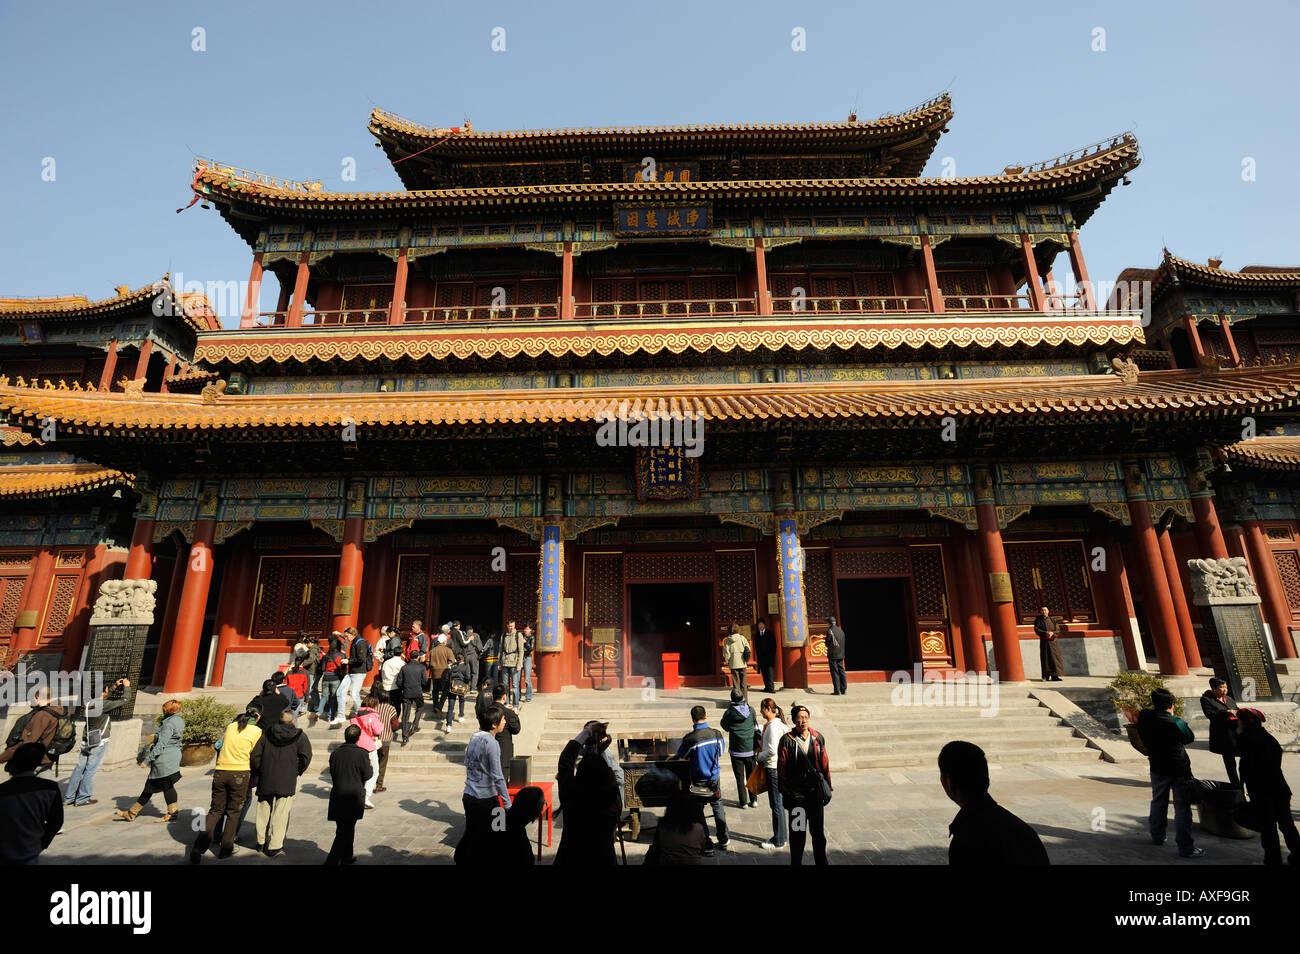 El Templo Lama en Beijing, China. 24-Mar-2008 Foto de stock